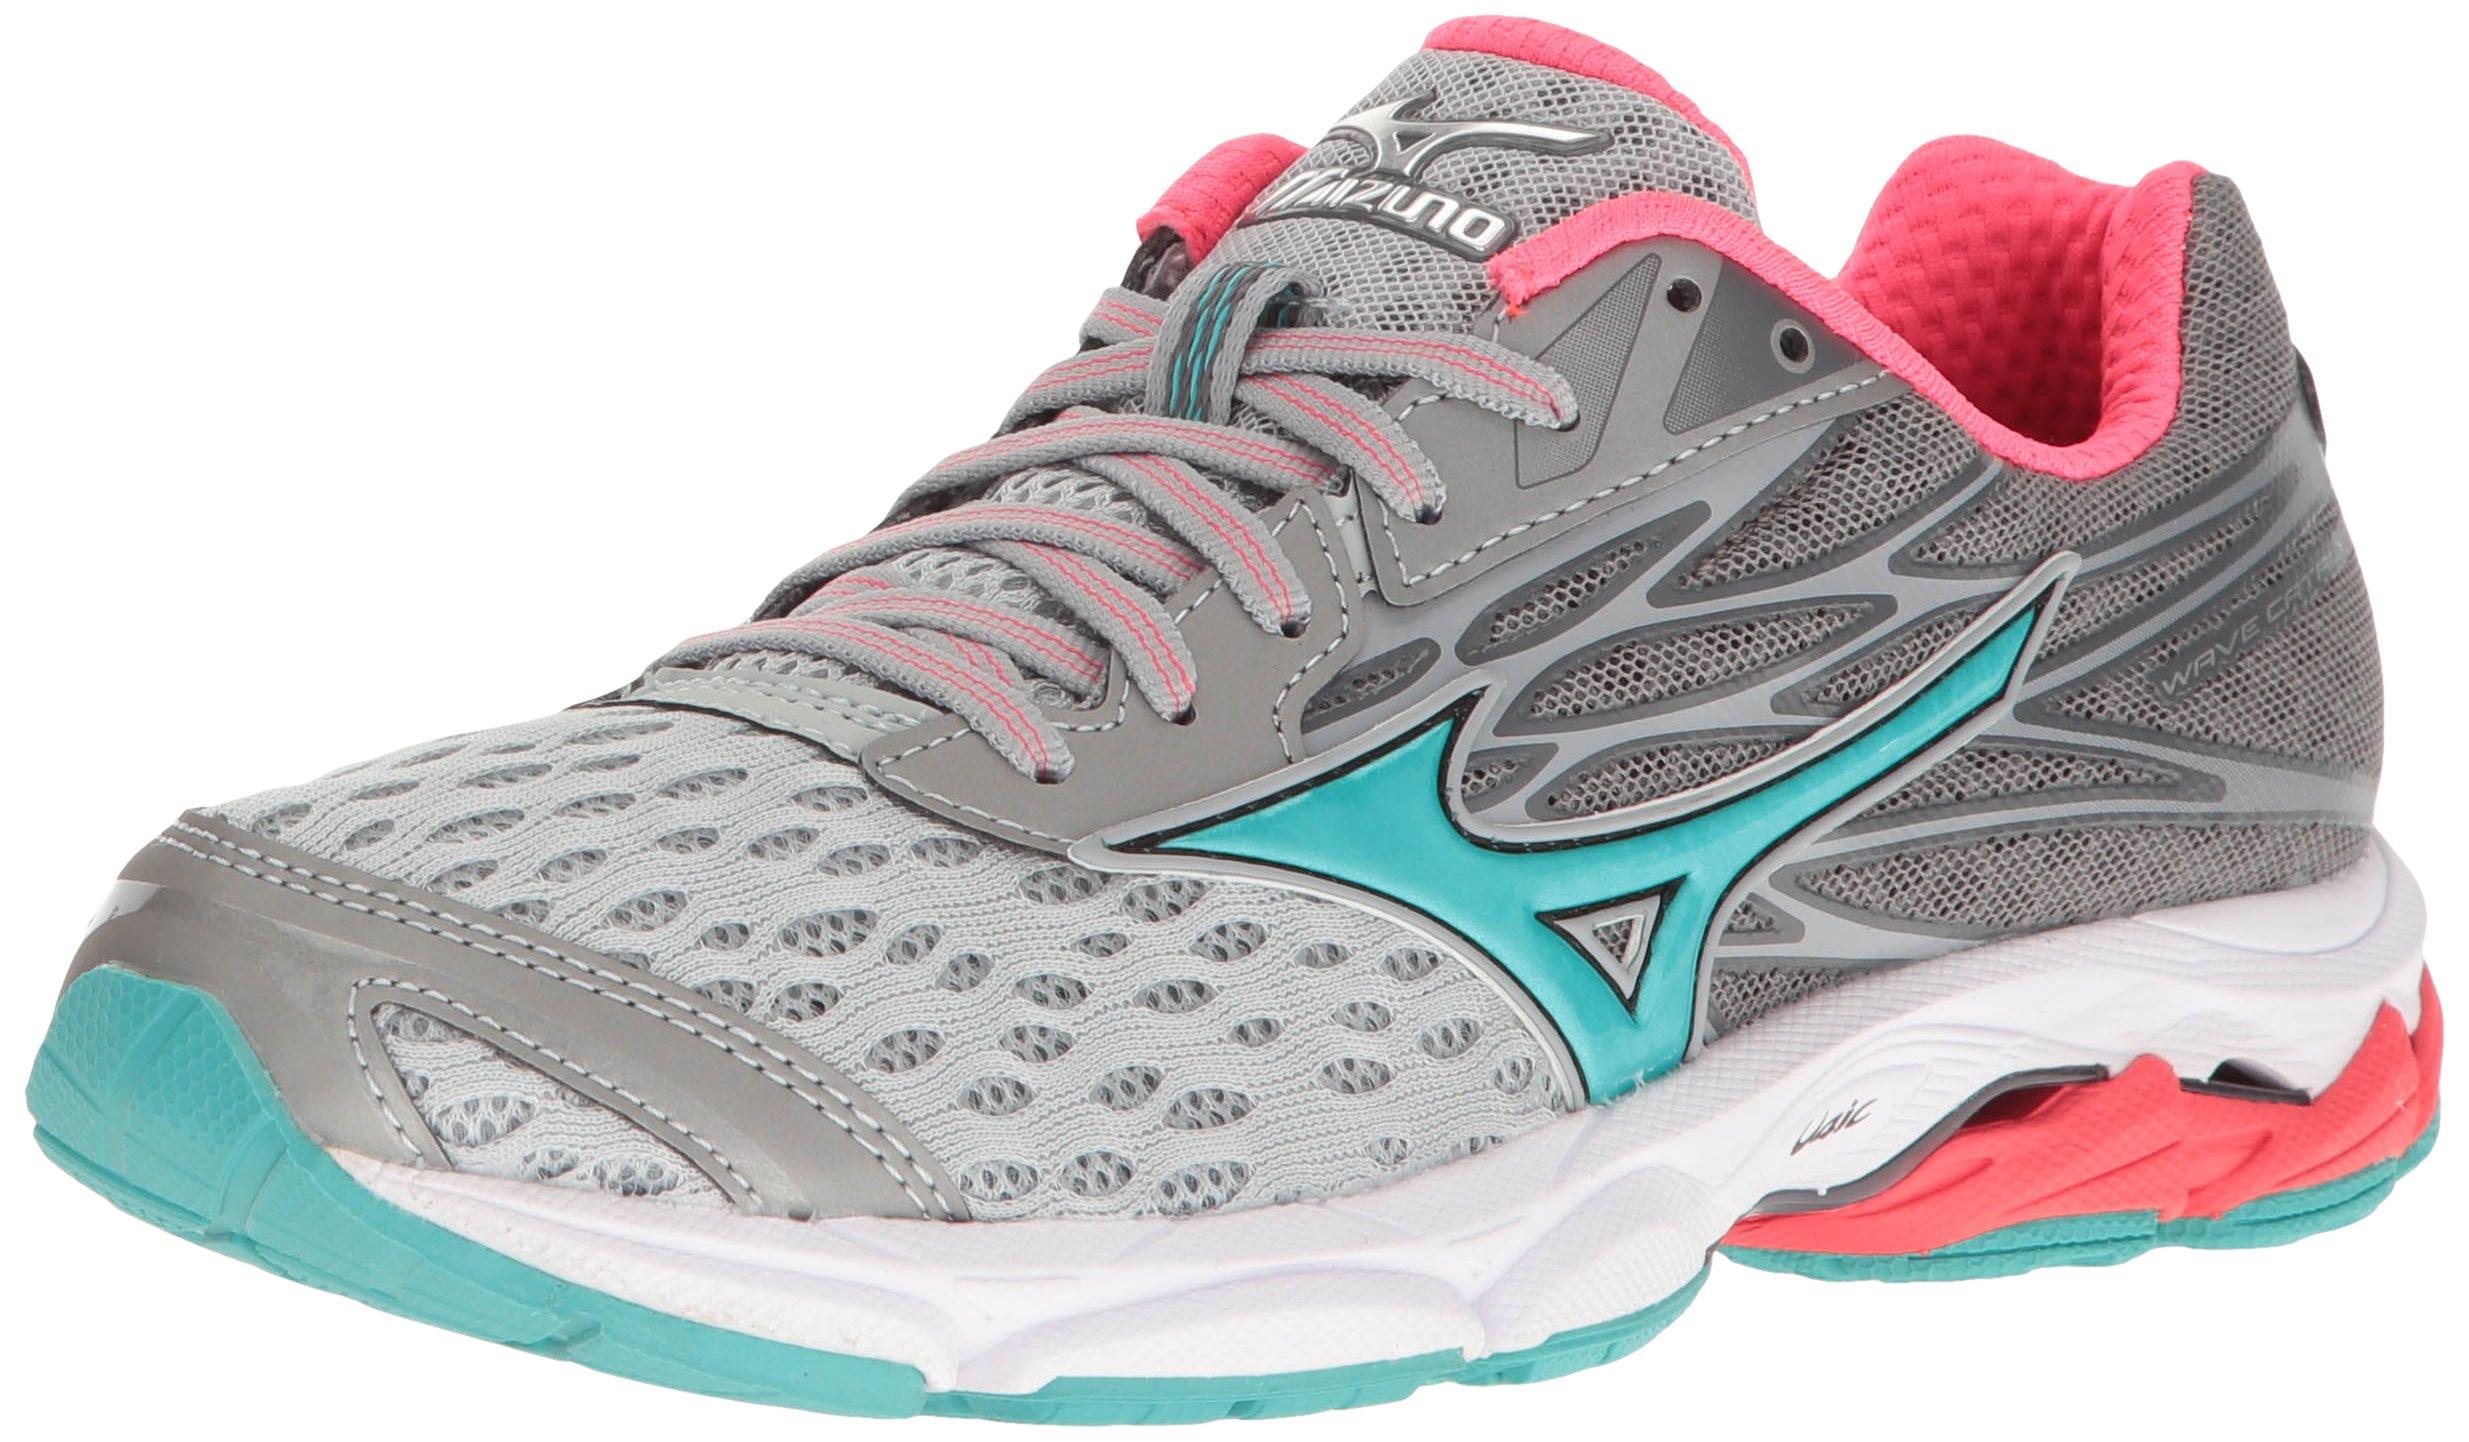 Mizuno Women's Wave Catalyst 2 Running Shoe, Grey/Mint, 9 B US